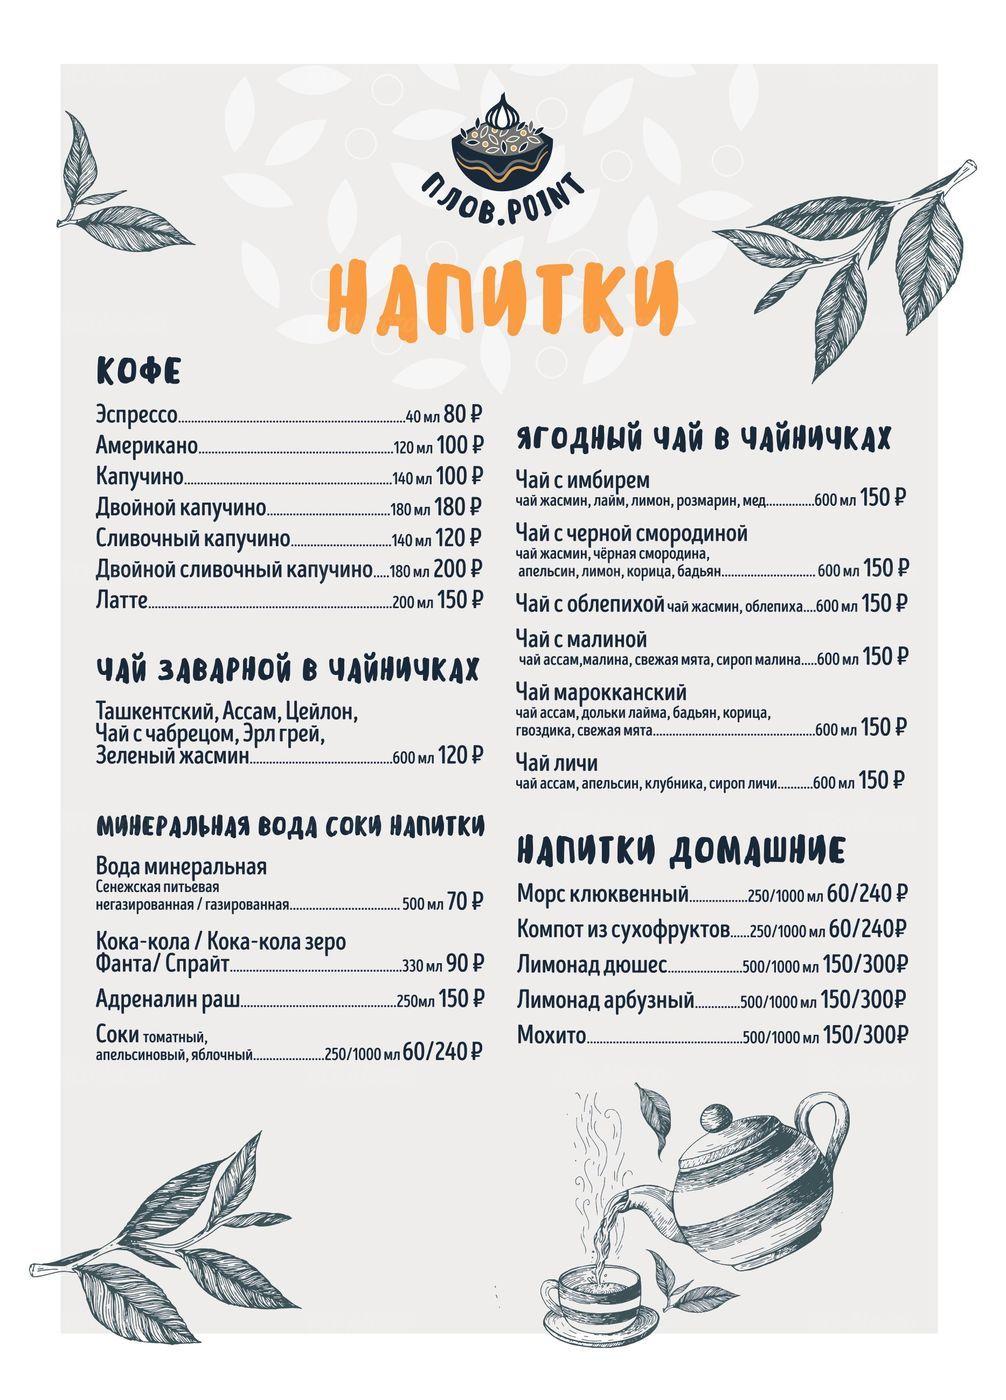 Меню кафе Плов Поинт (Плов.Point) на Салтыковской фото 3